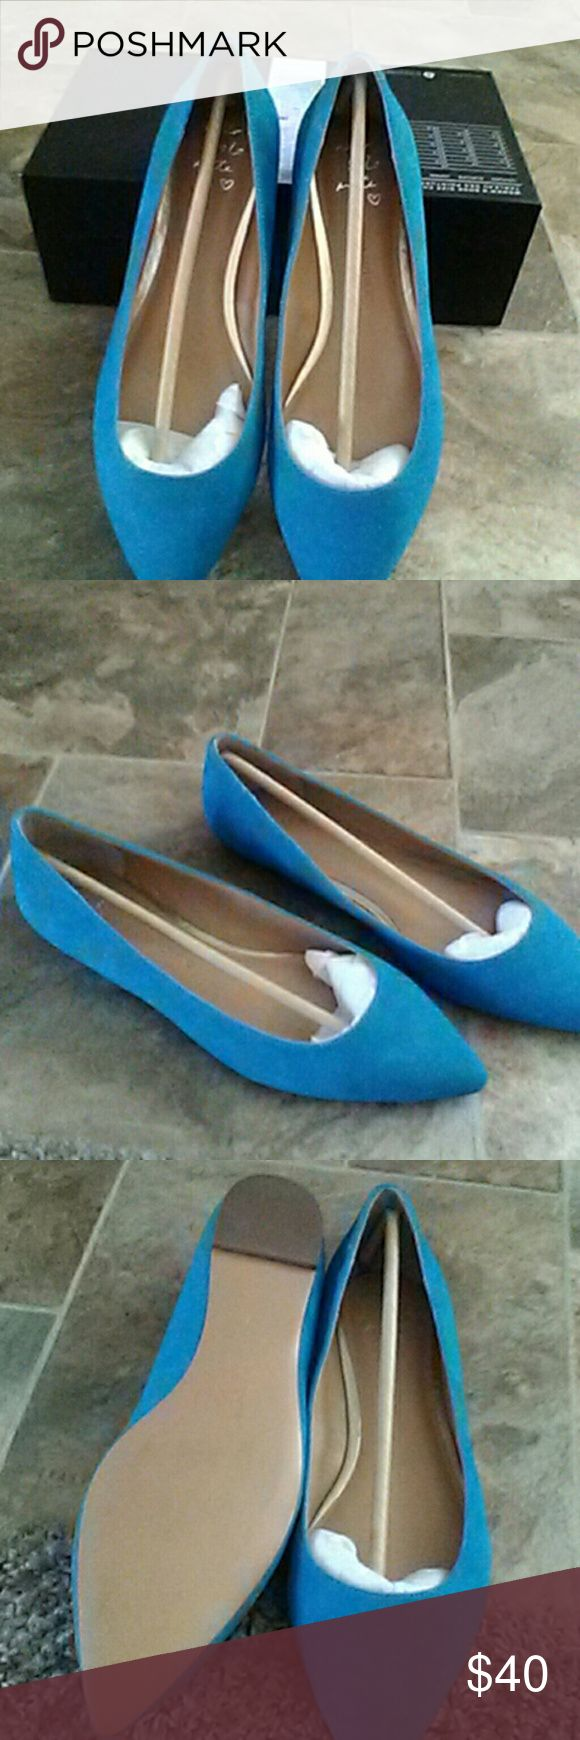 Banana Republic brand new shoes Suede flat shoes. Banana Republic Shoes Flats & Loafers